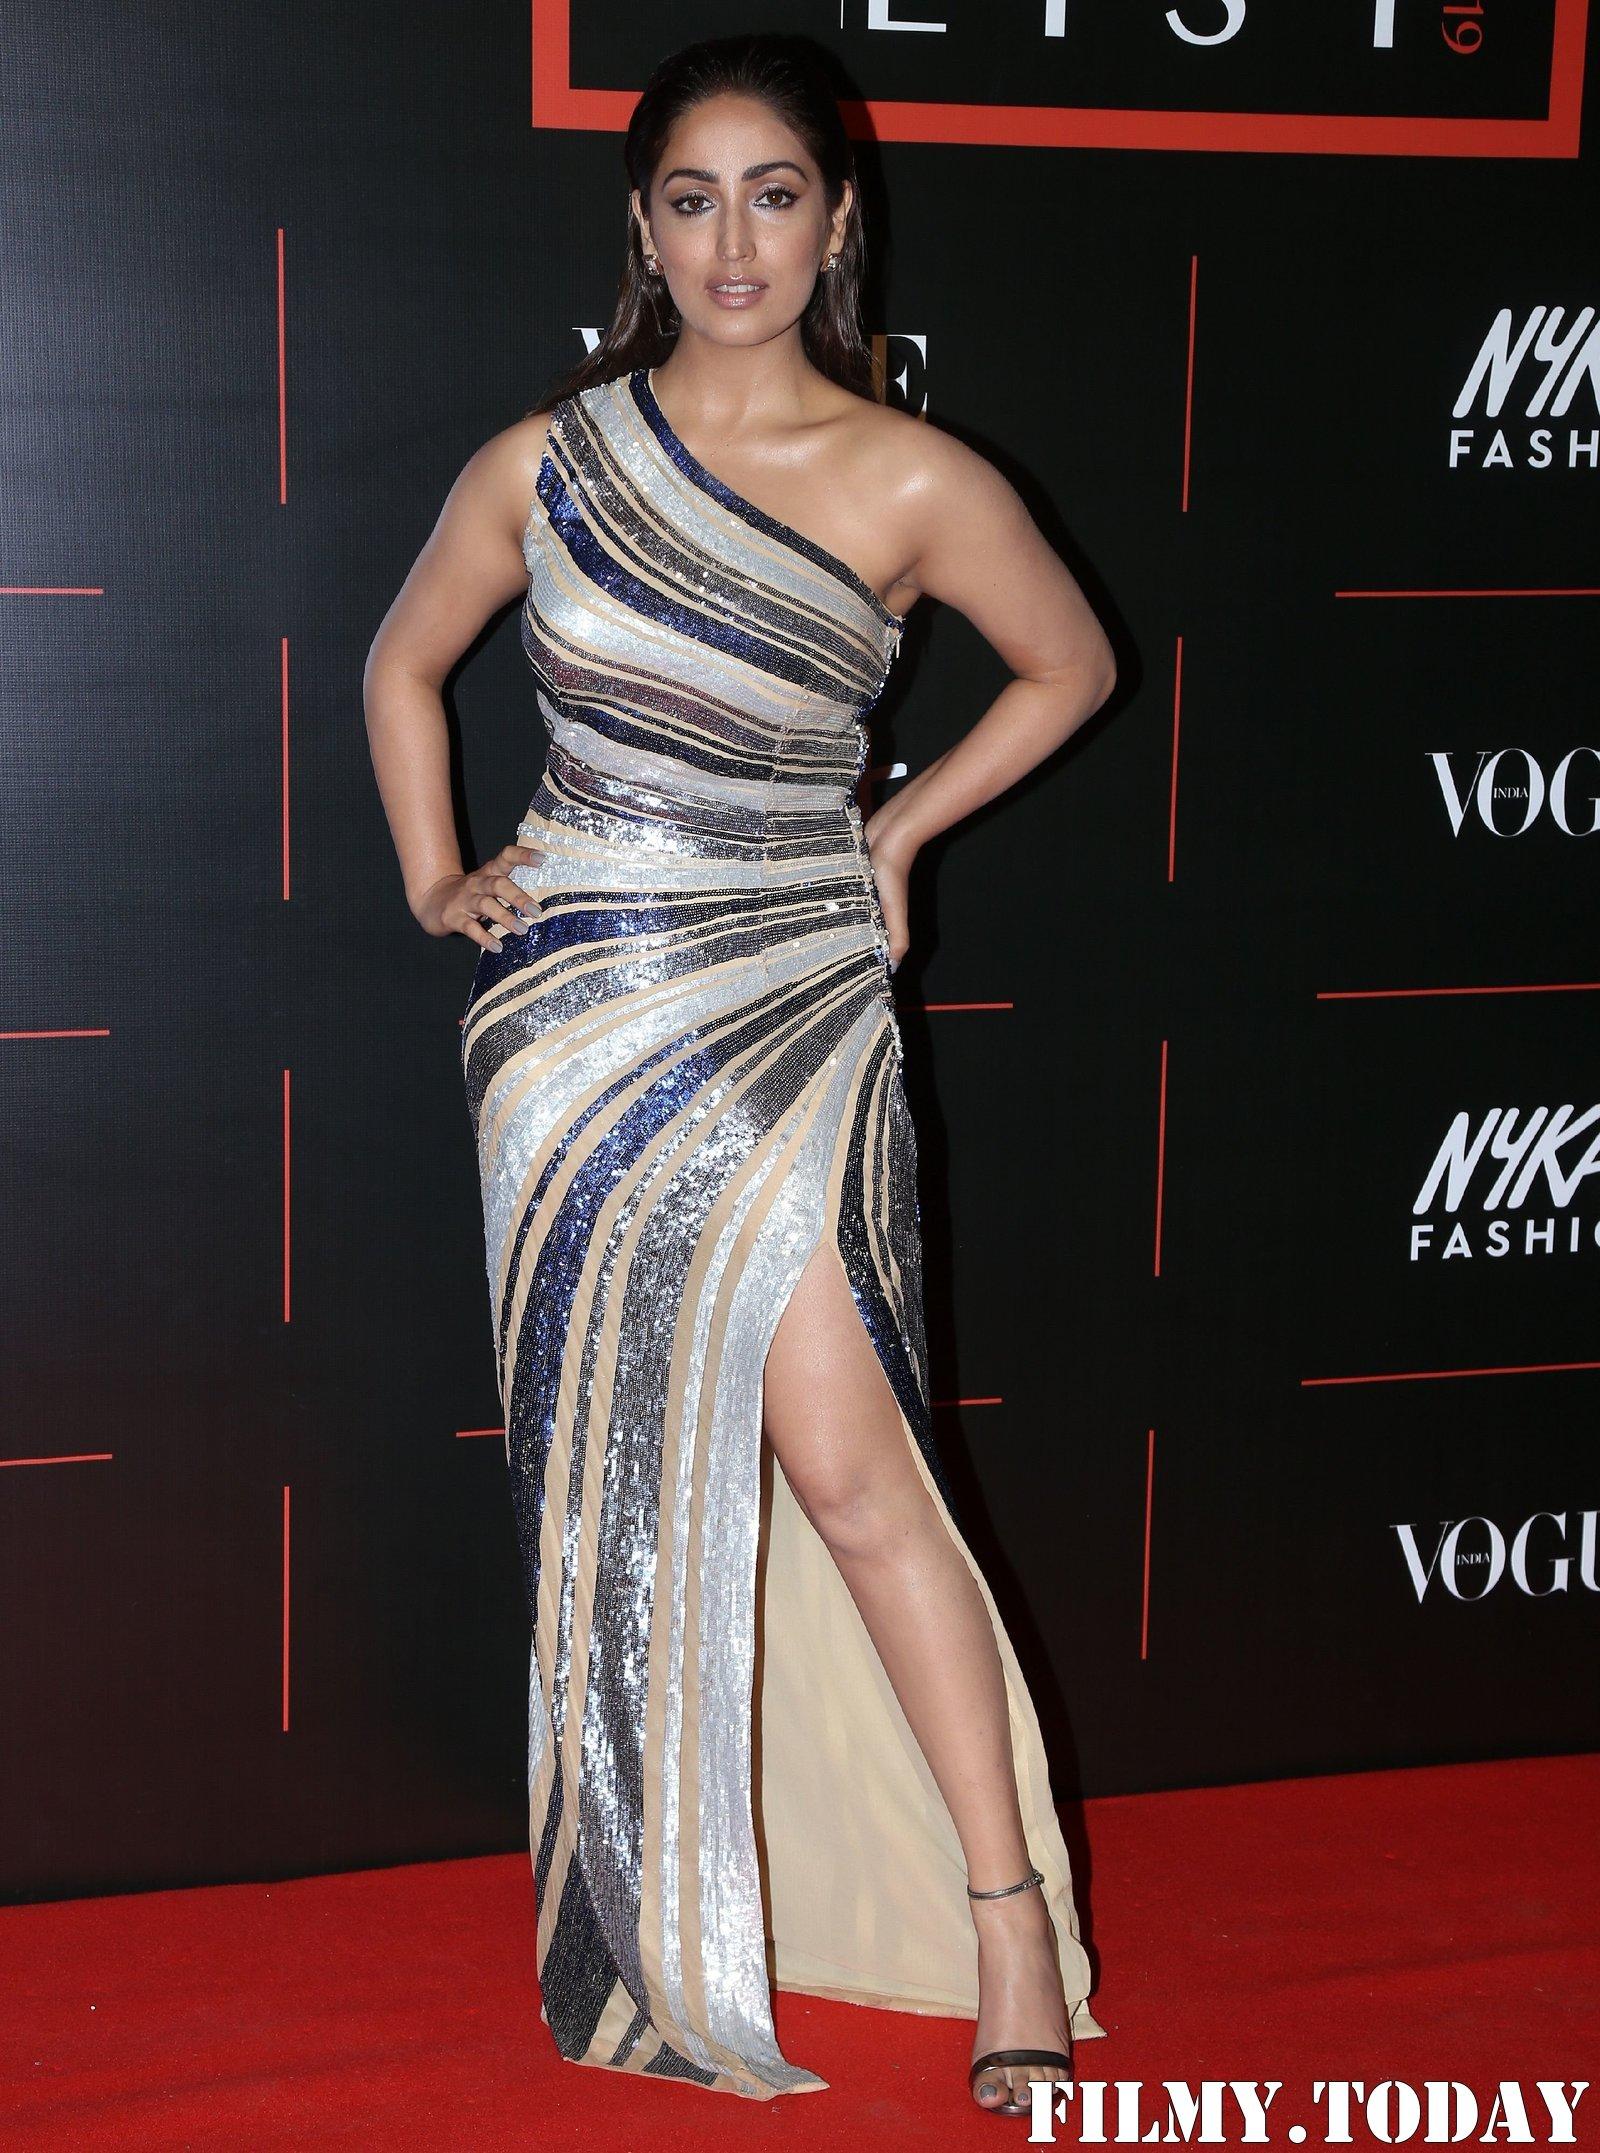 Yami Gautam - Photos: Celebs At Vogue The Power List 2019 At St Regis Hotel | Picture 1706346